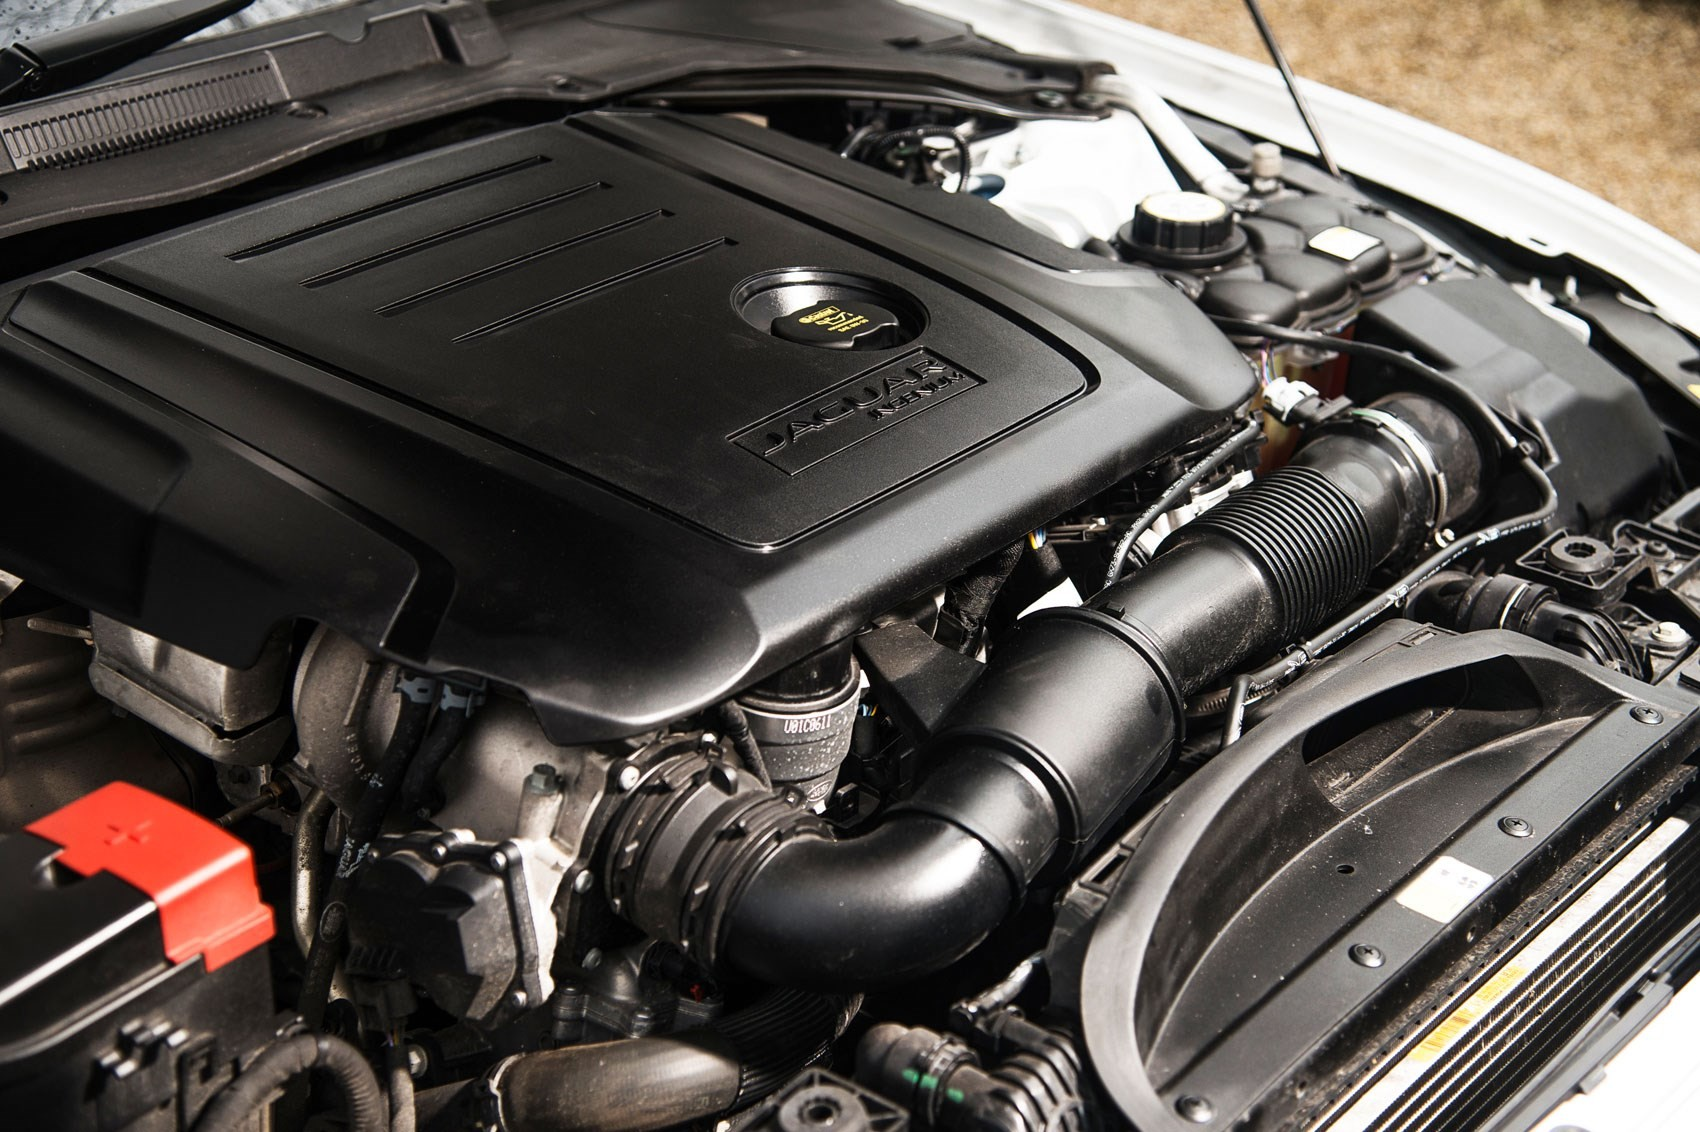 Jaguar X Type 2 0 Diesel Engine Diagram 2 Jaguar Xe R Sport 2 0 2017 Long Term Test Review Of Jaguar X Type 2 0 Diesel Engine Diagram 2